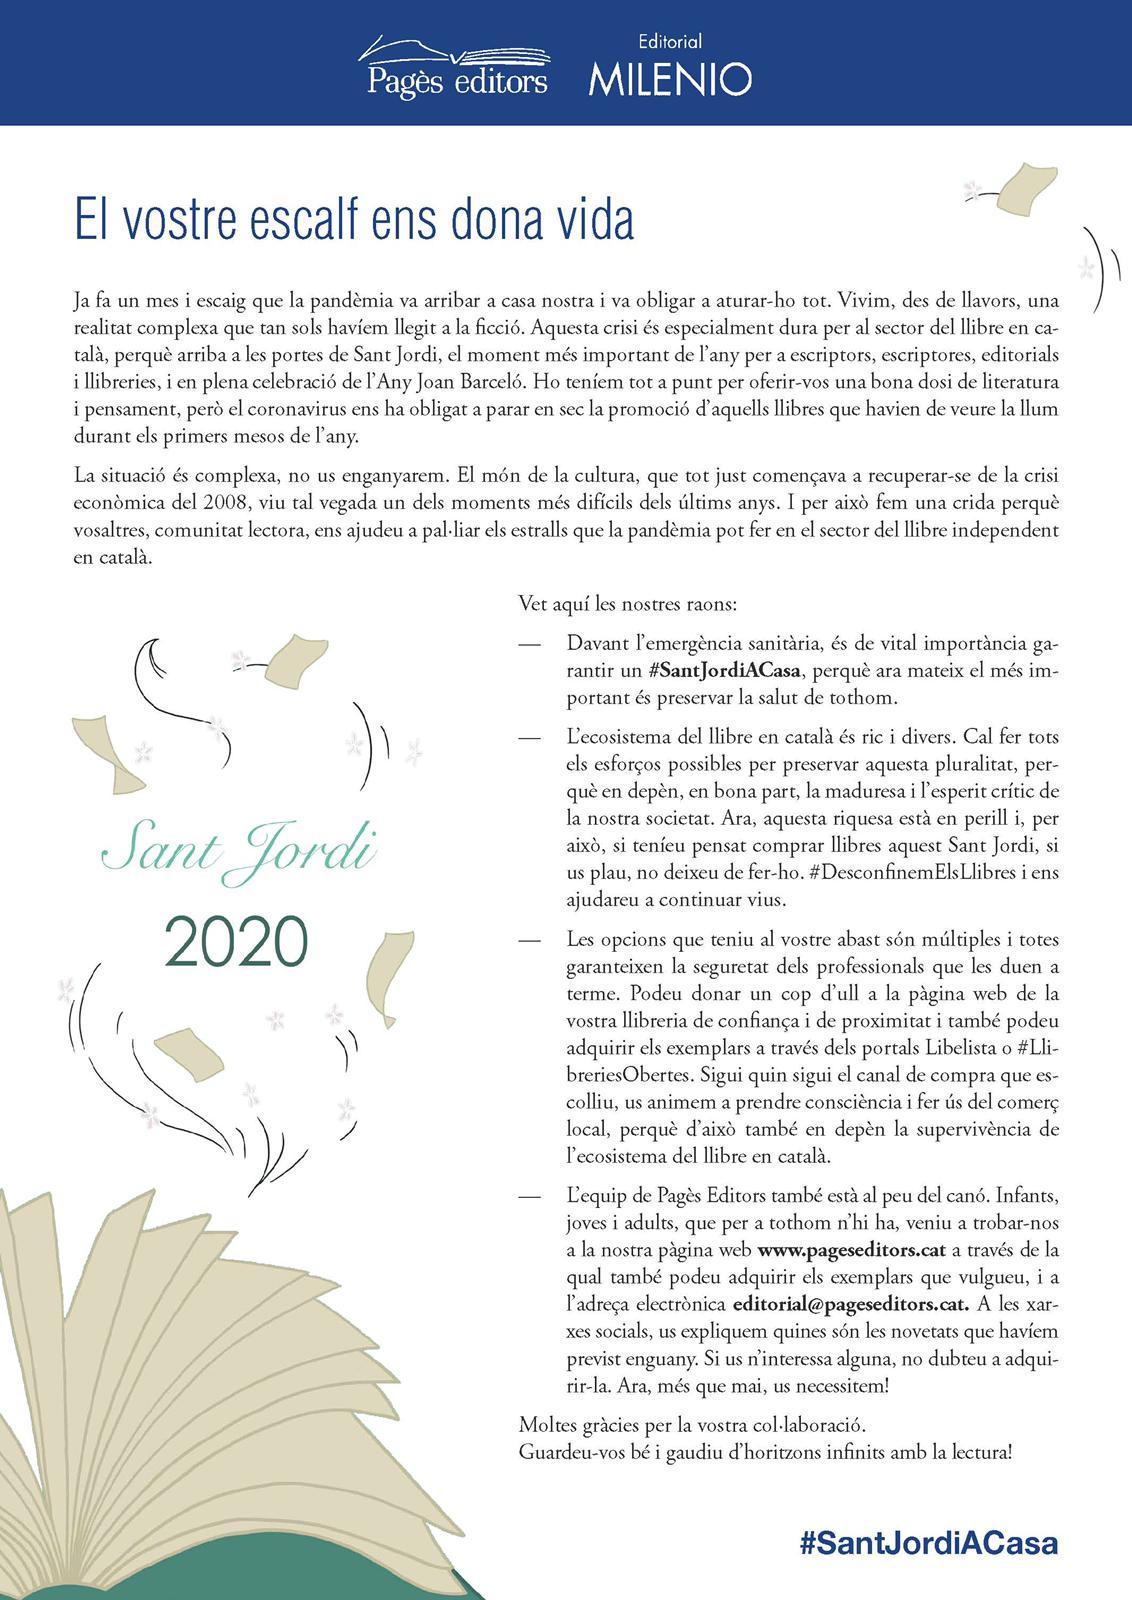 PAGÈS EDITORS COMUNICAT.jpg